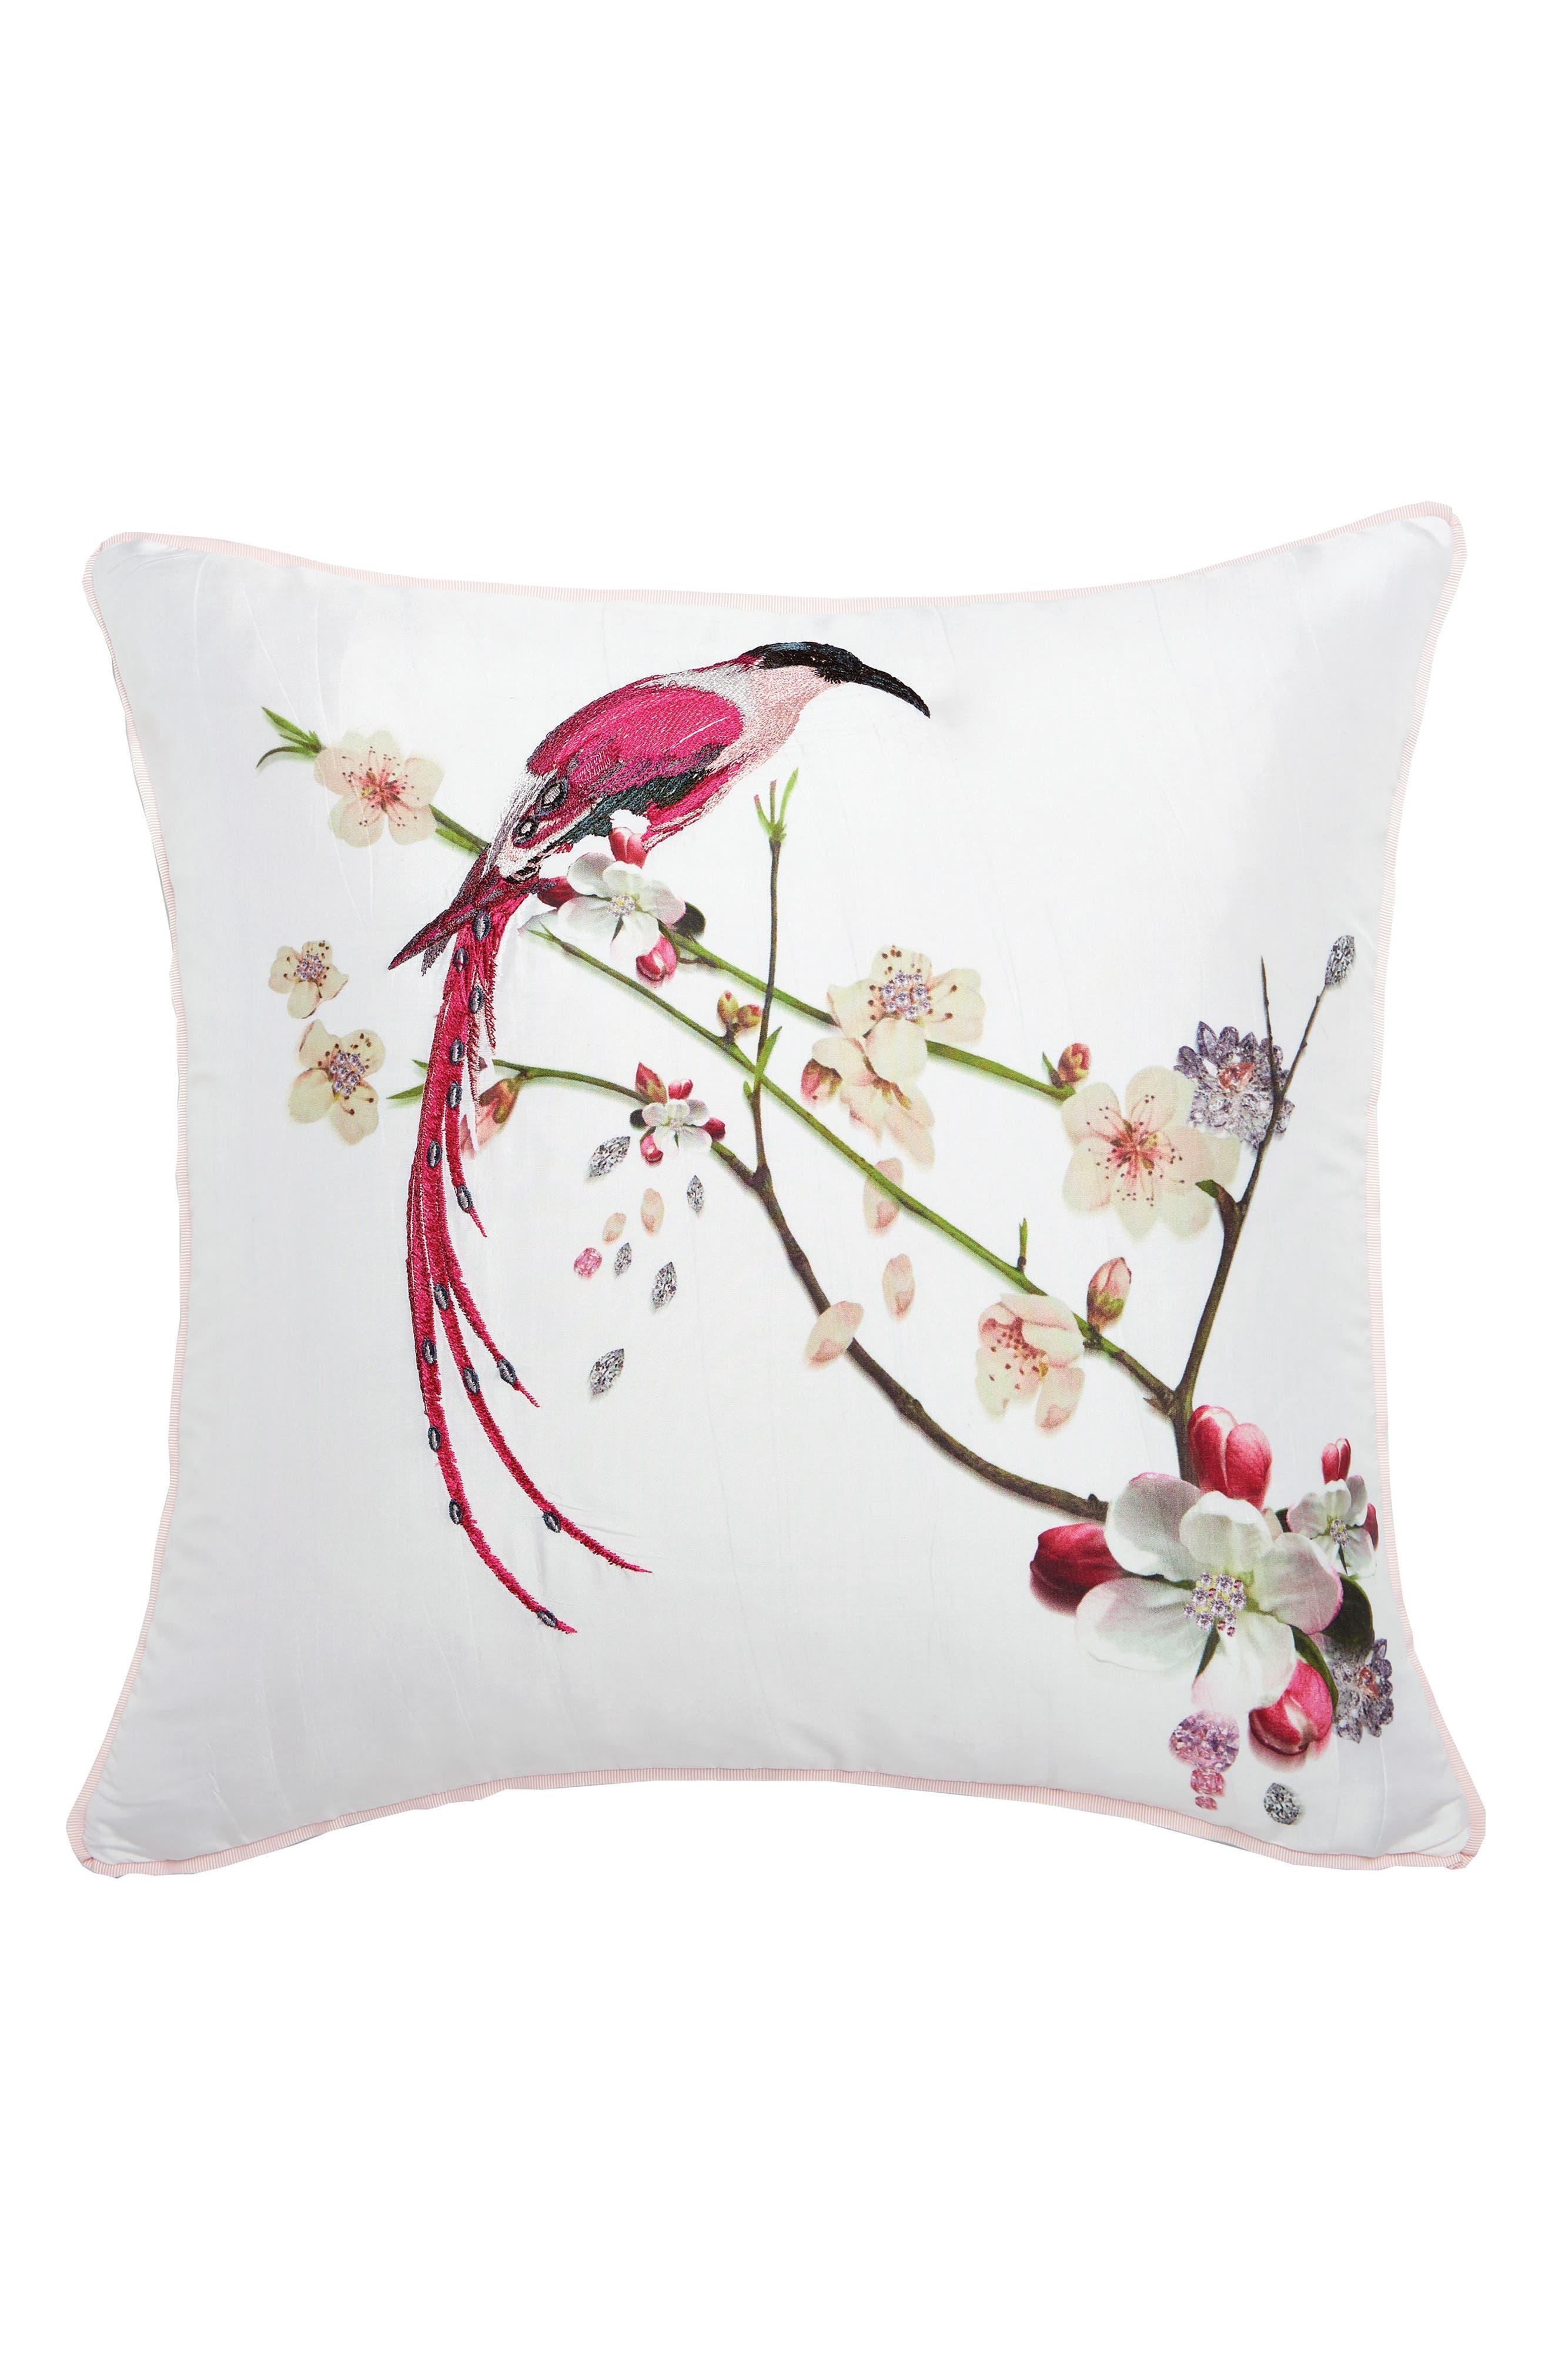 Bird Print Pillow,                             Main thumbnail 1, color,                             WHITE/ MULTI